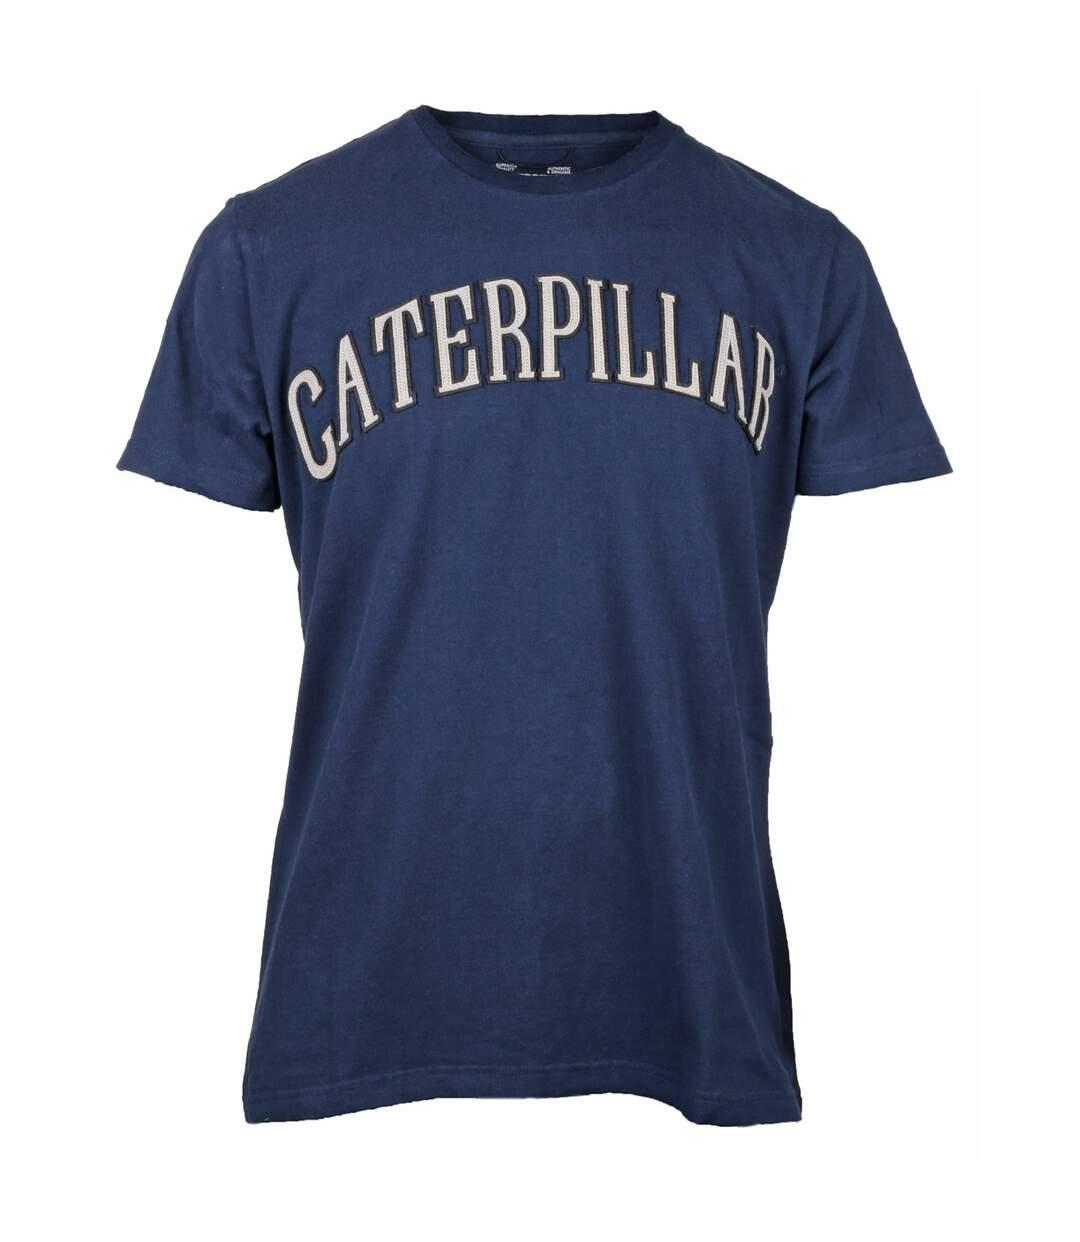 CAT - T-shirt LIFESTYLE - Hommes (Bleu) - UTFS5370